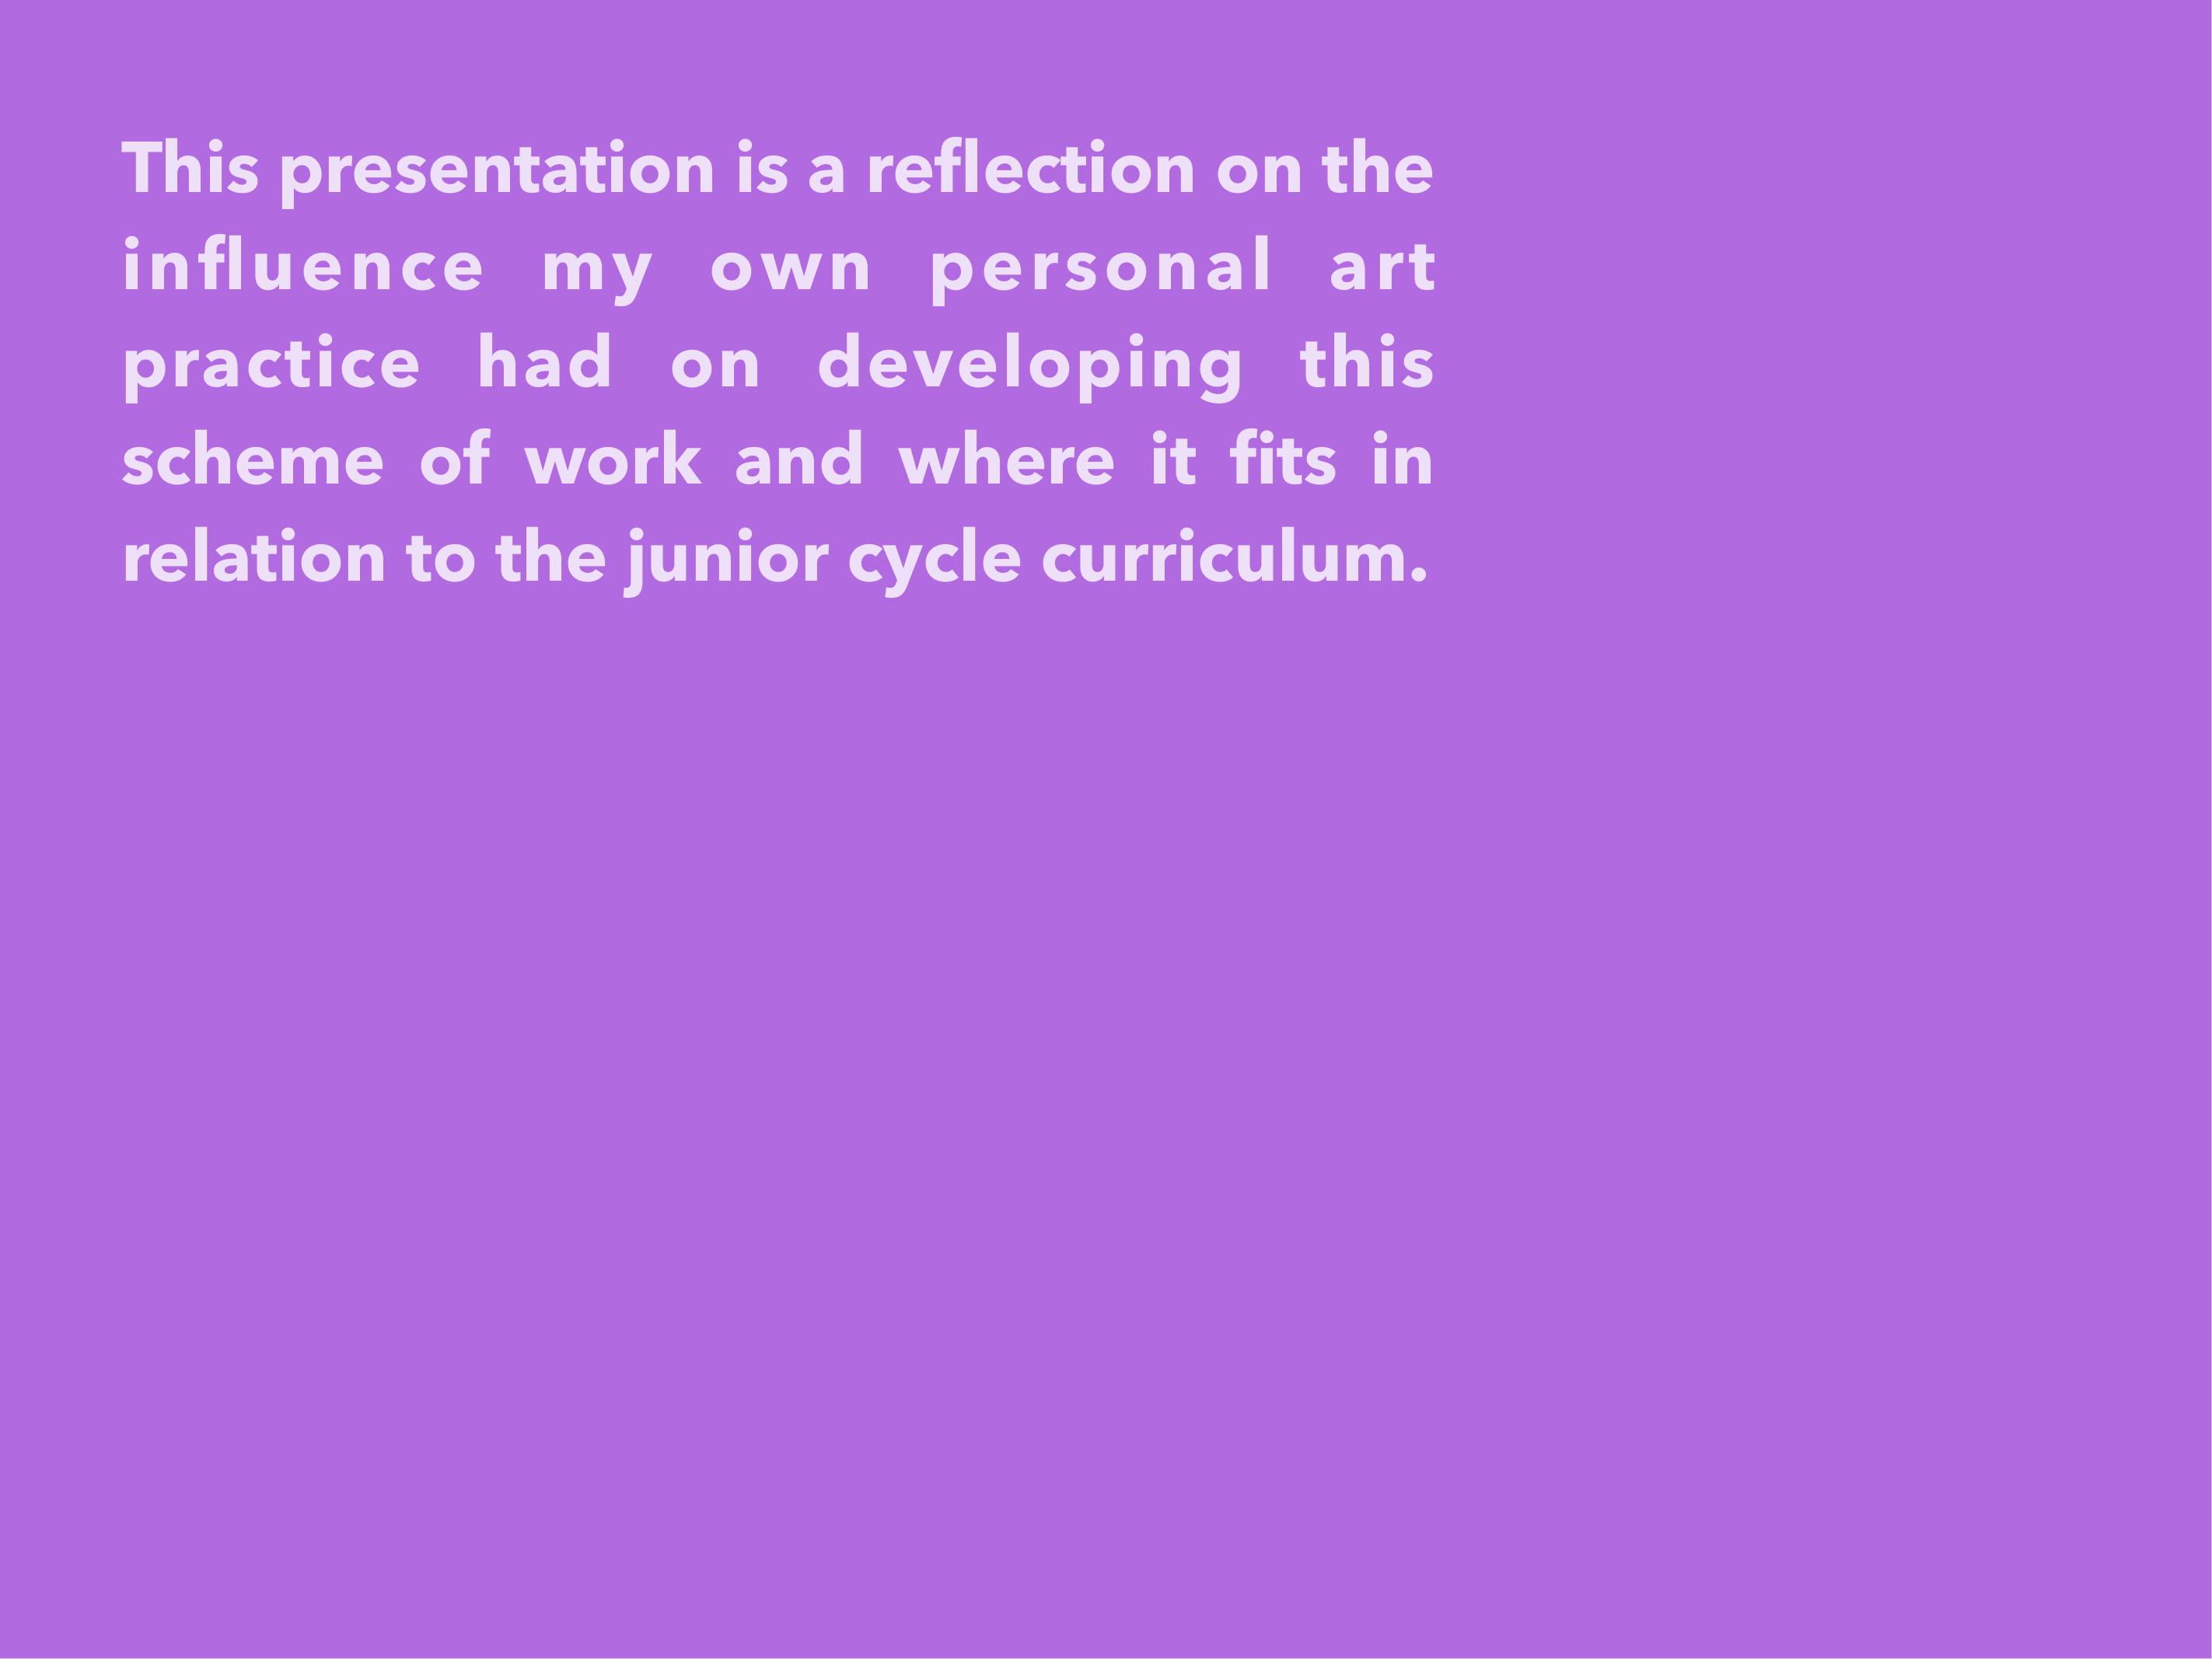 Niamh O'Toole Reflection 2017-02